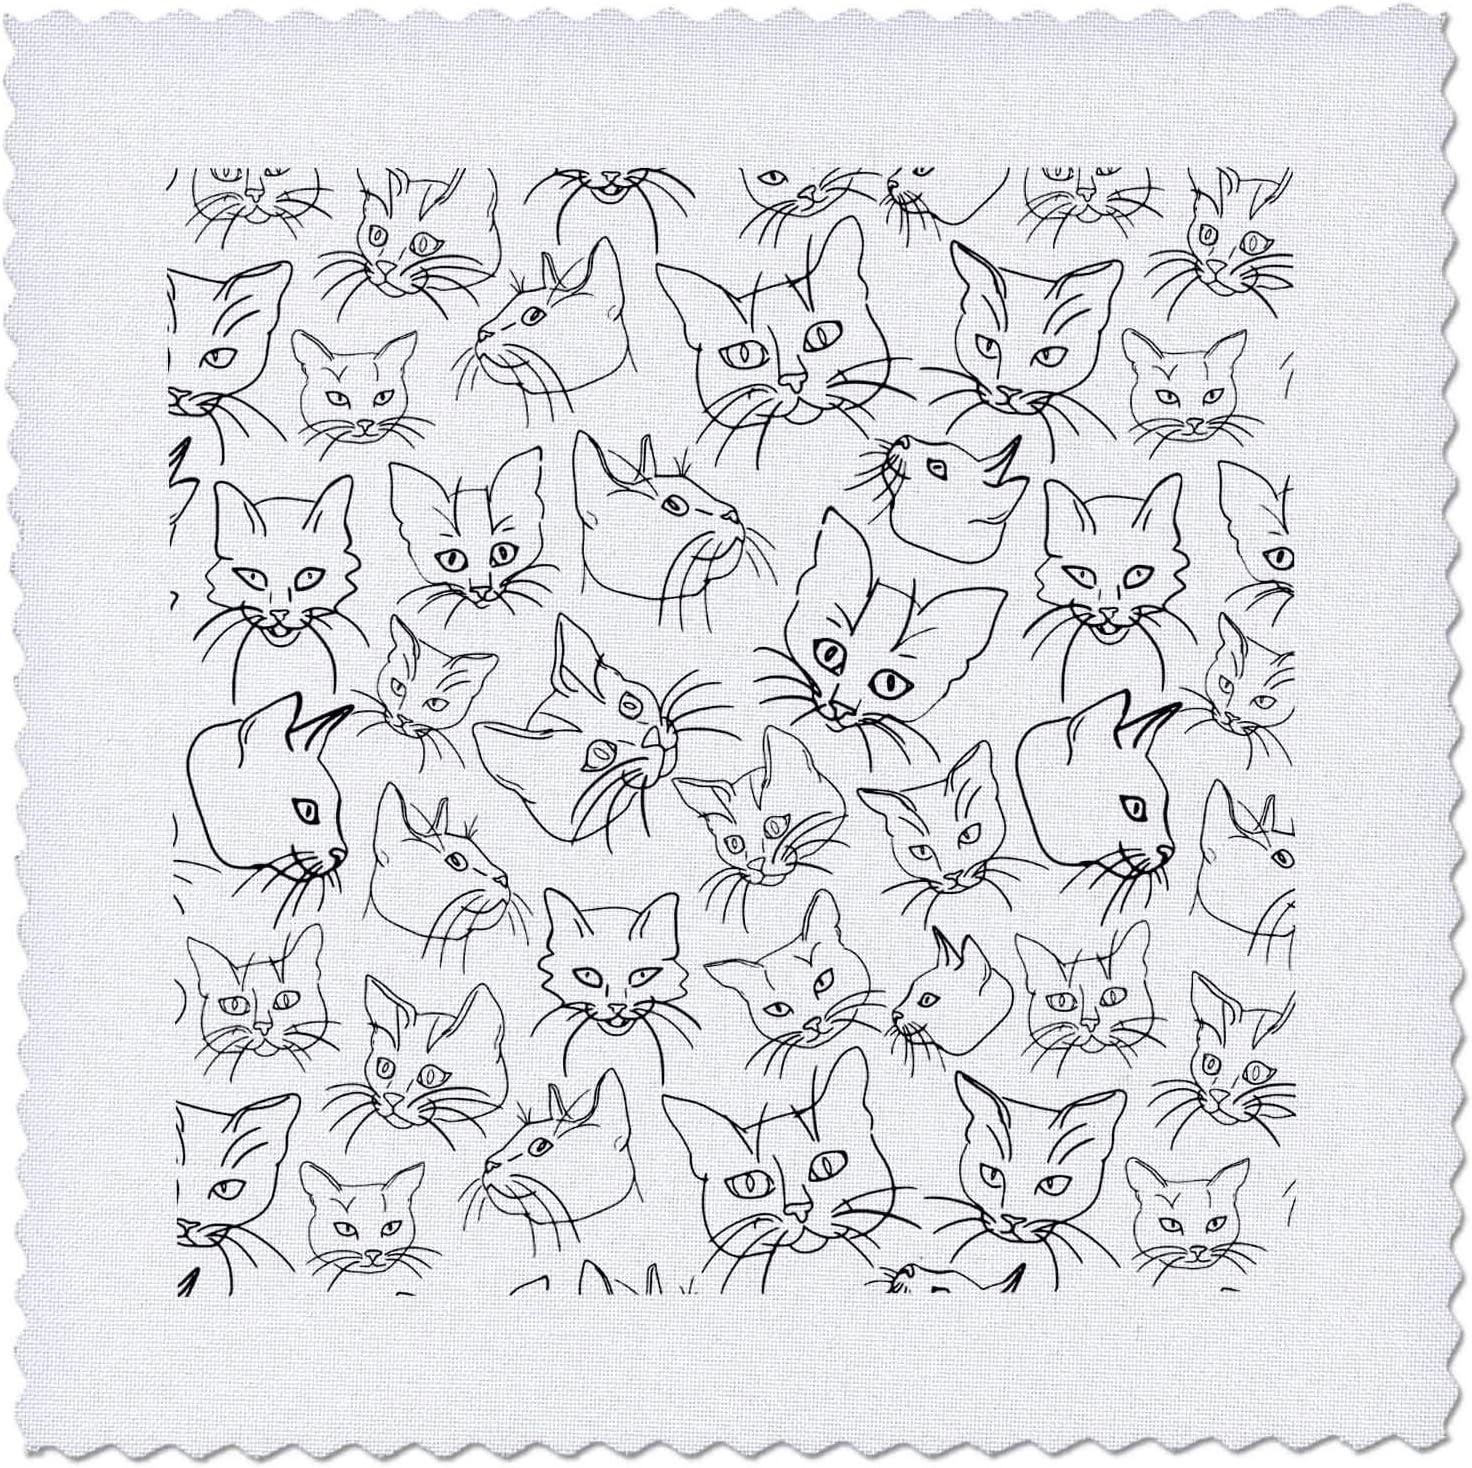 3dRose Janna Salak Designs Line Faces Cute - Cat Daily bargain sale Art Max 90% OFF